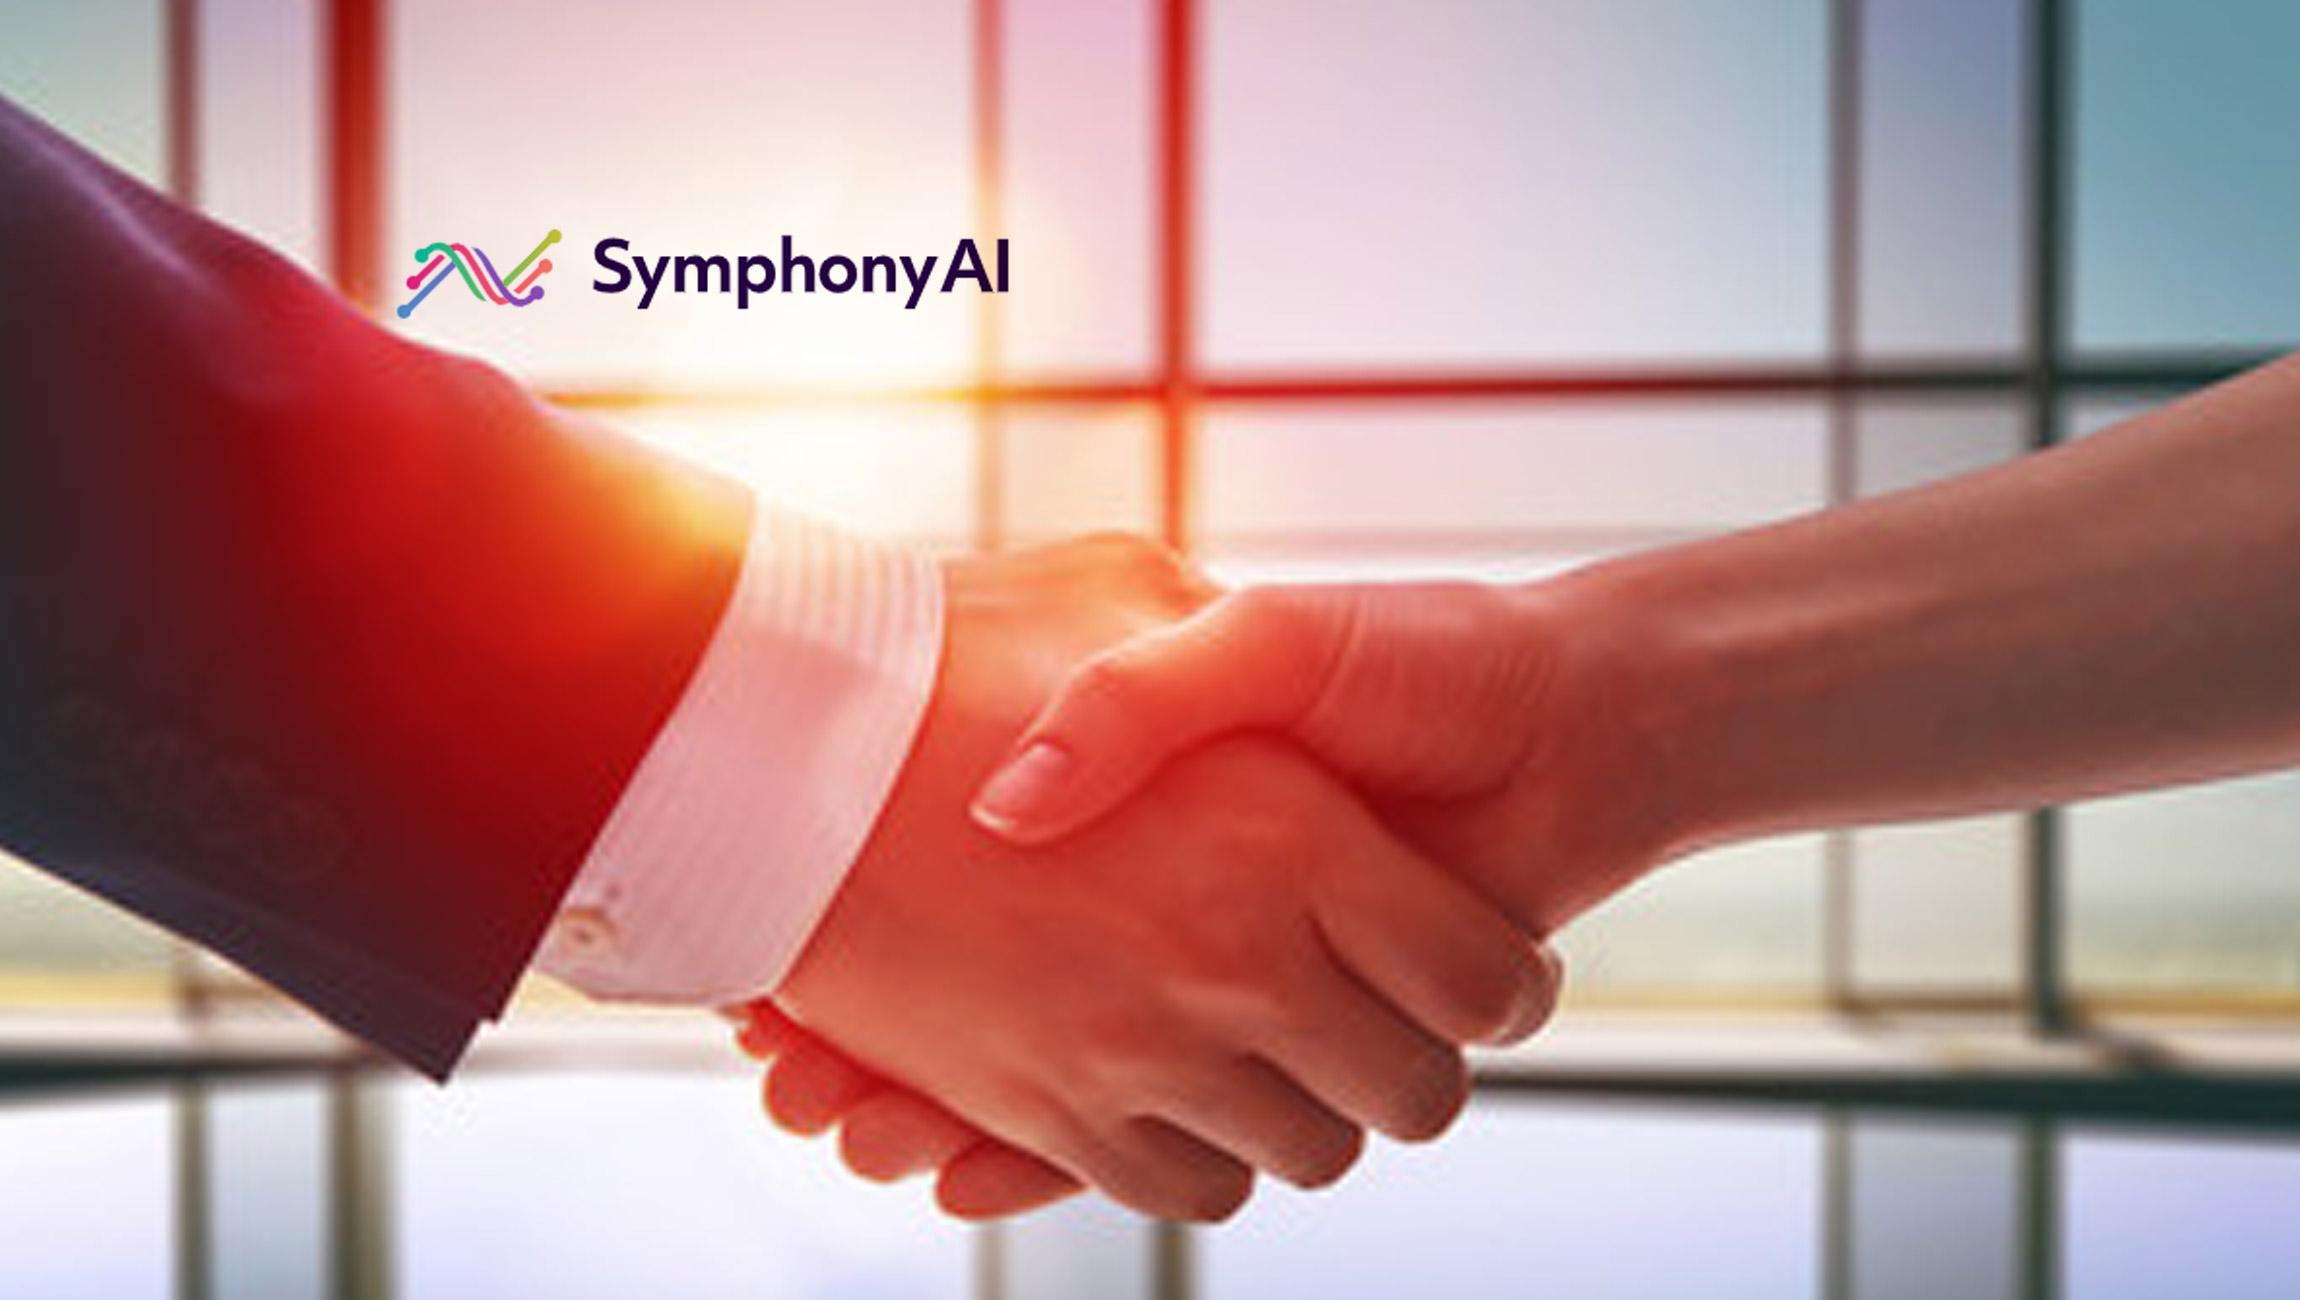 SymphonyAI Announces Enterprise AI Research Partnership with Semmelweis University Heart and Vascular Center to Predict Healthcare Outcomes